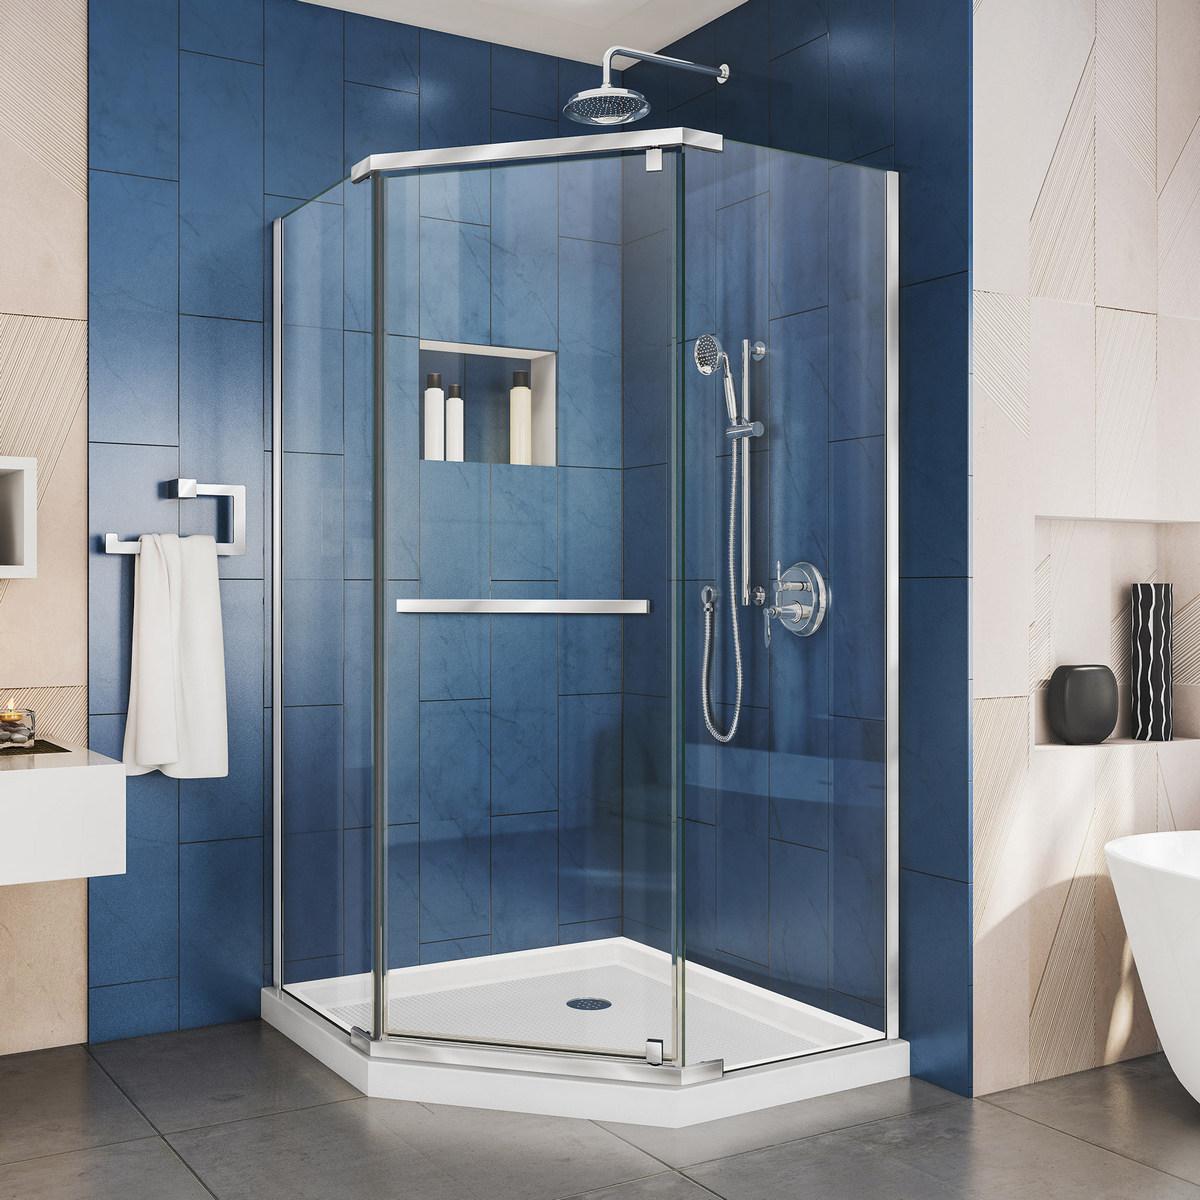 Dreamline Pivot Shower Enclosure Chrome Corner Drain White Base Kit